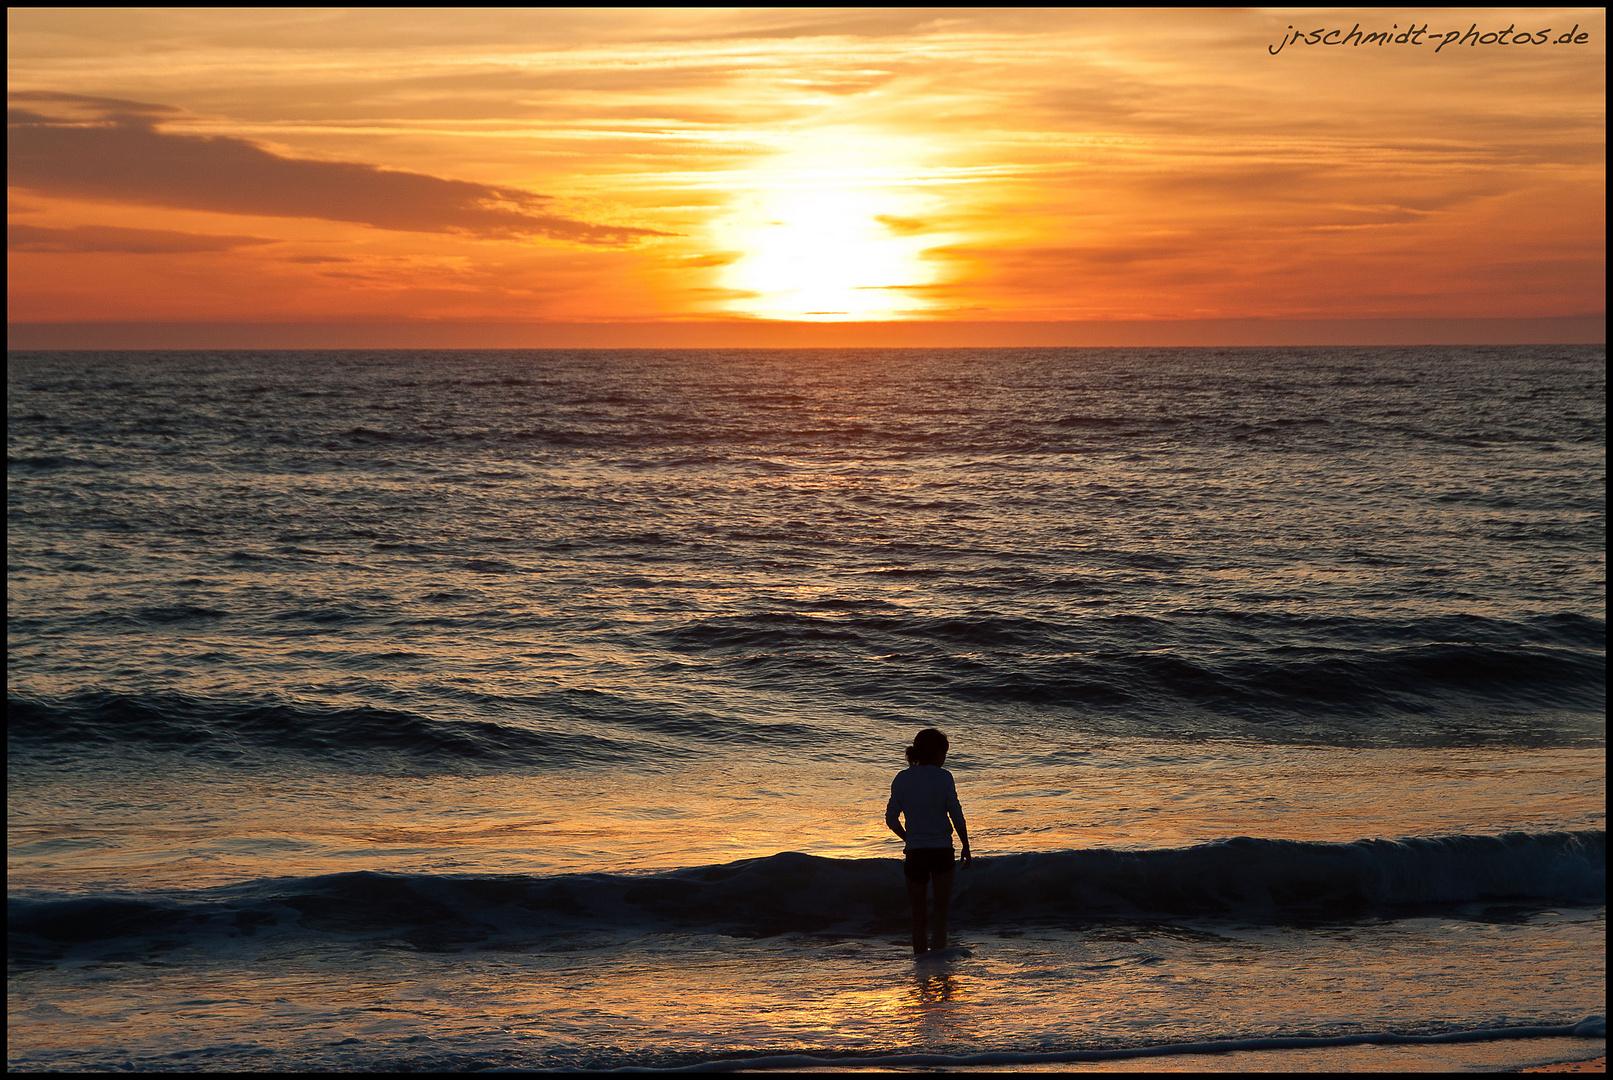 Sunset #001